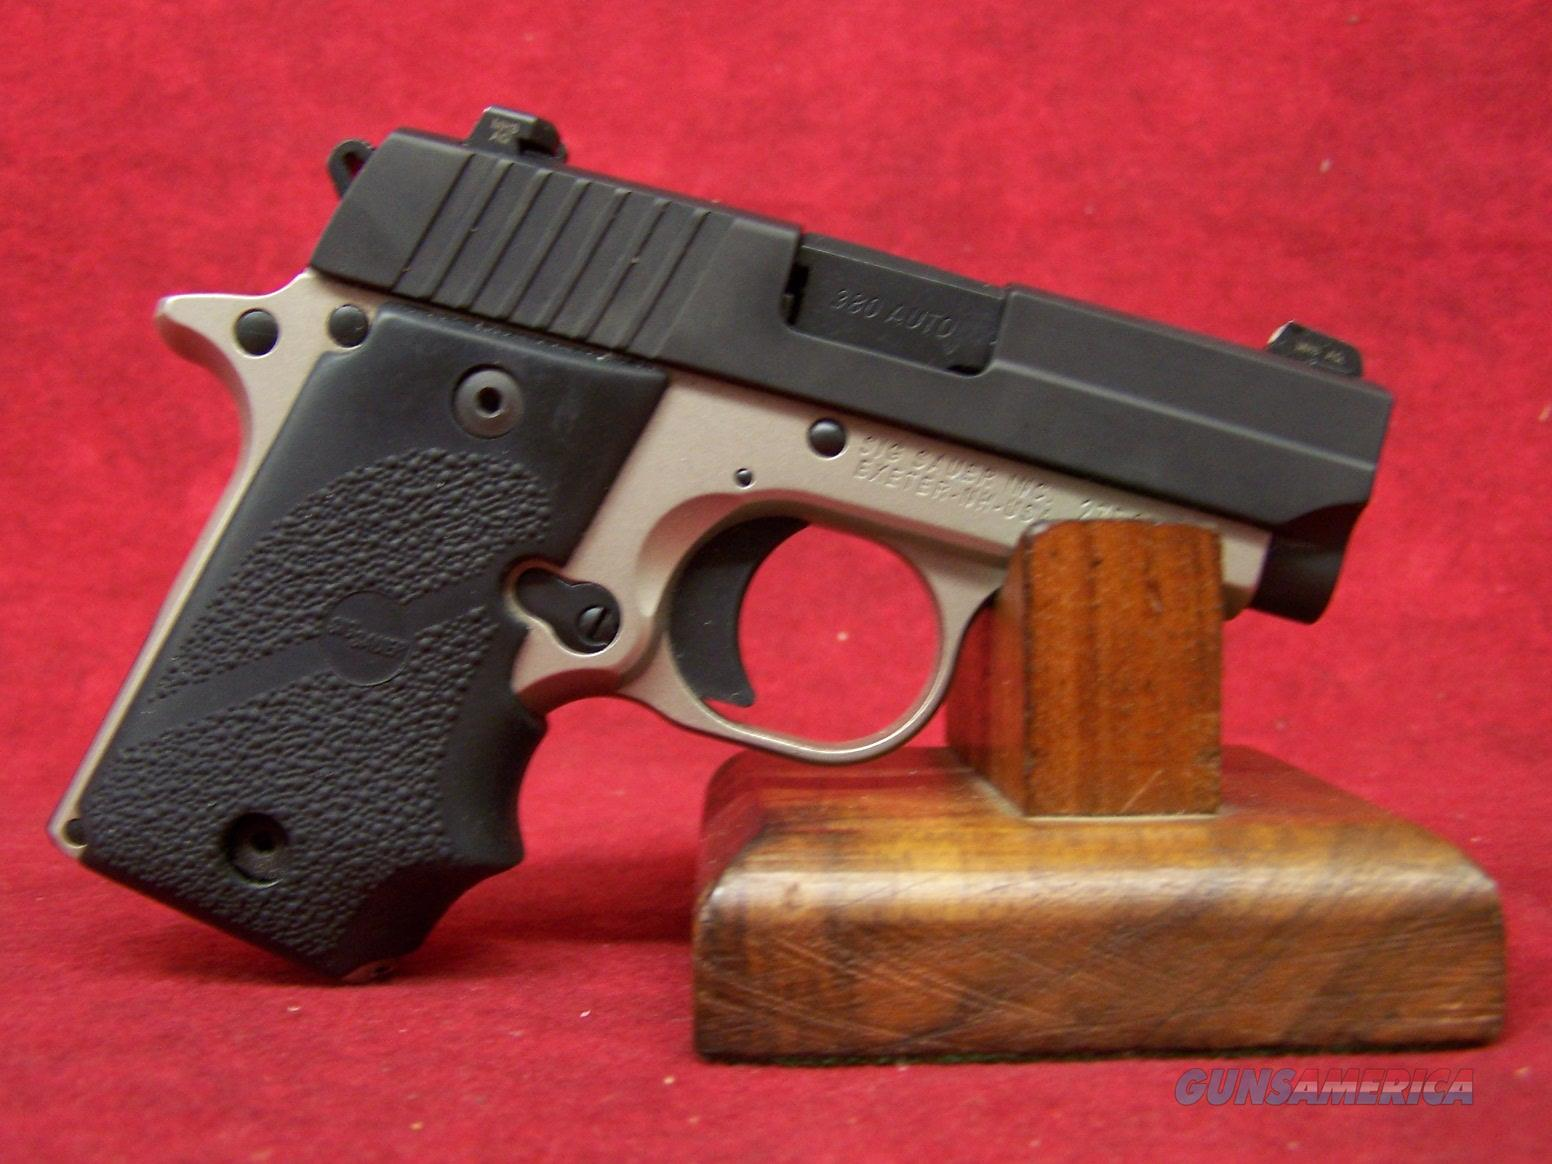 "Sig Sauer P238 2-Tone Platinum .380 Auto 2.7"" Barrel w/ S-Lite   Guns > Pistols > Sig - Sauer/Sigarms Pistols > P238"